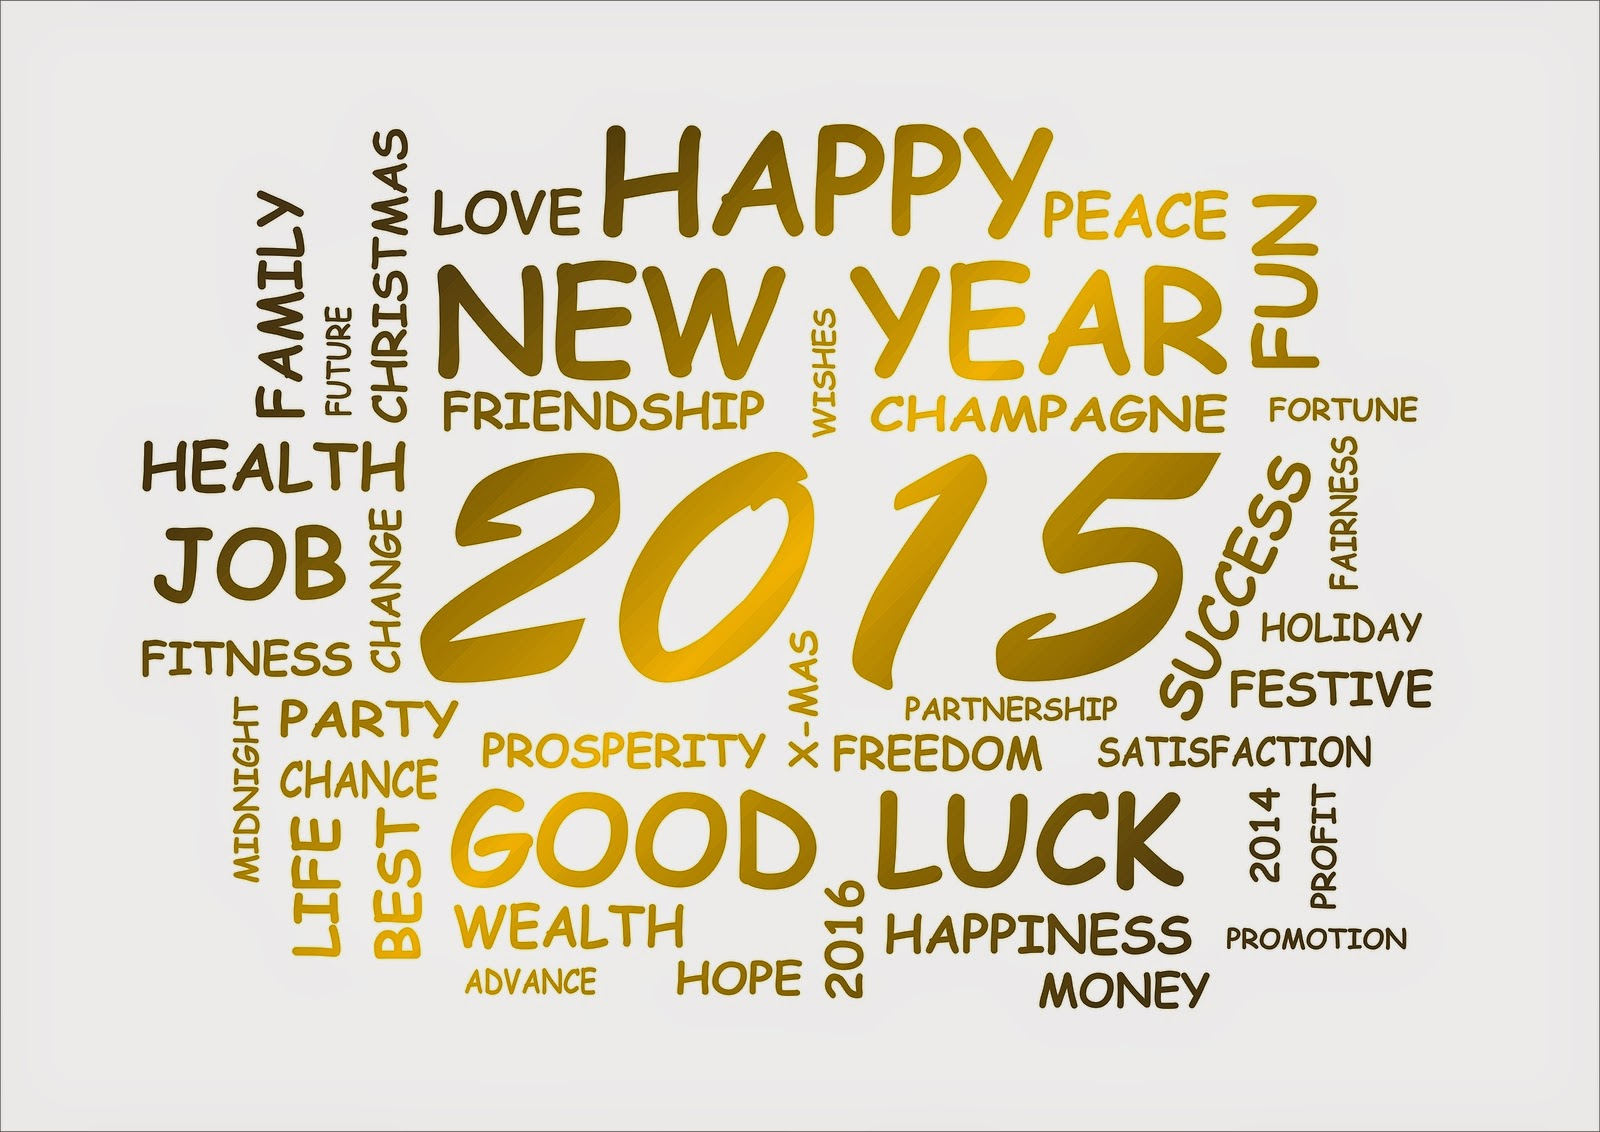 http://1.bp.blogspot.com/-48gM1K1rQOE/VJZe4FEGivI/AAAAAAAAJNc/g3C7OWDEtH0/s1600/new-year-happy.jpg